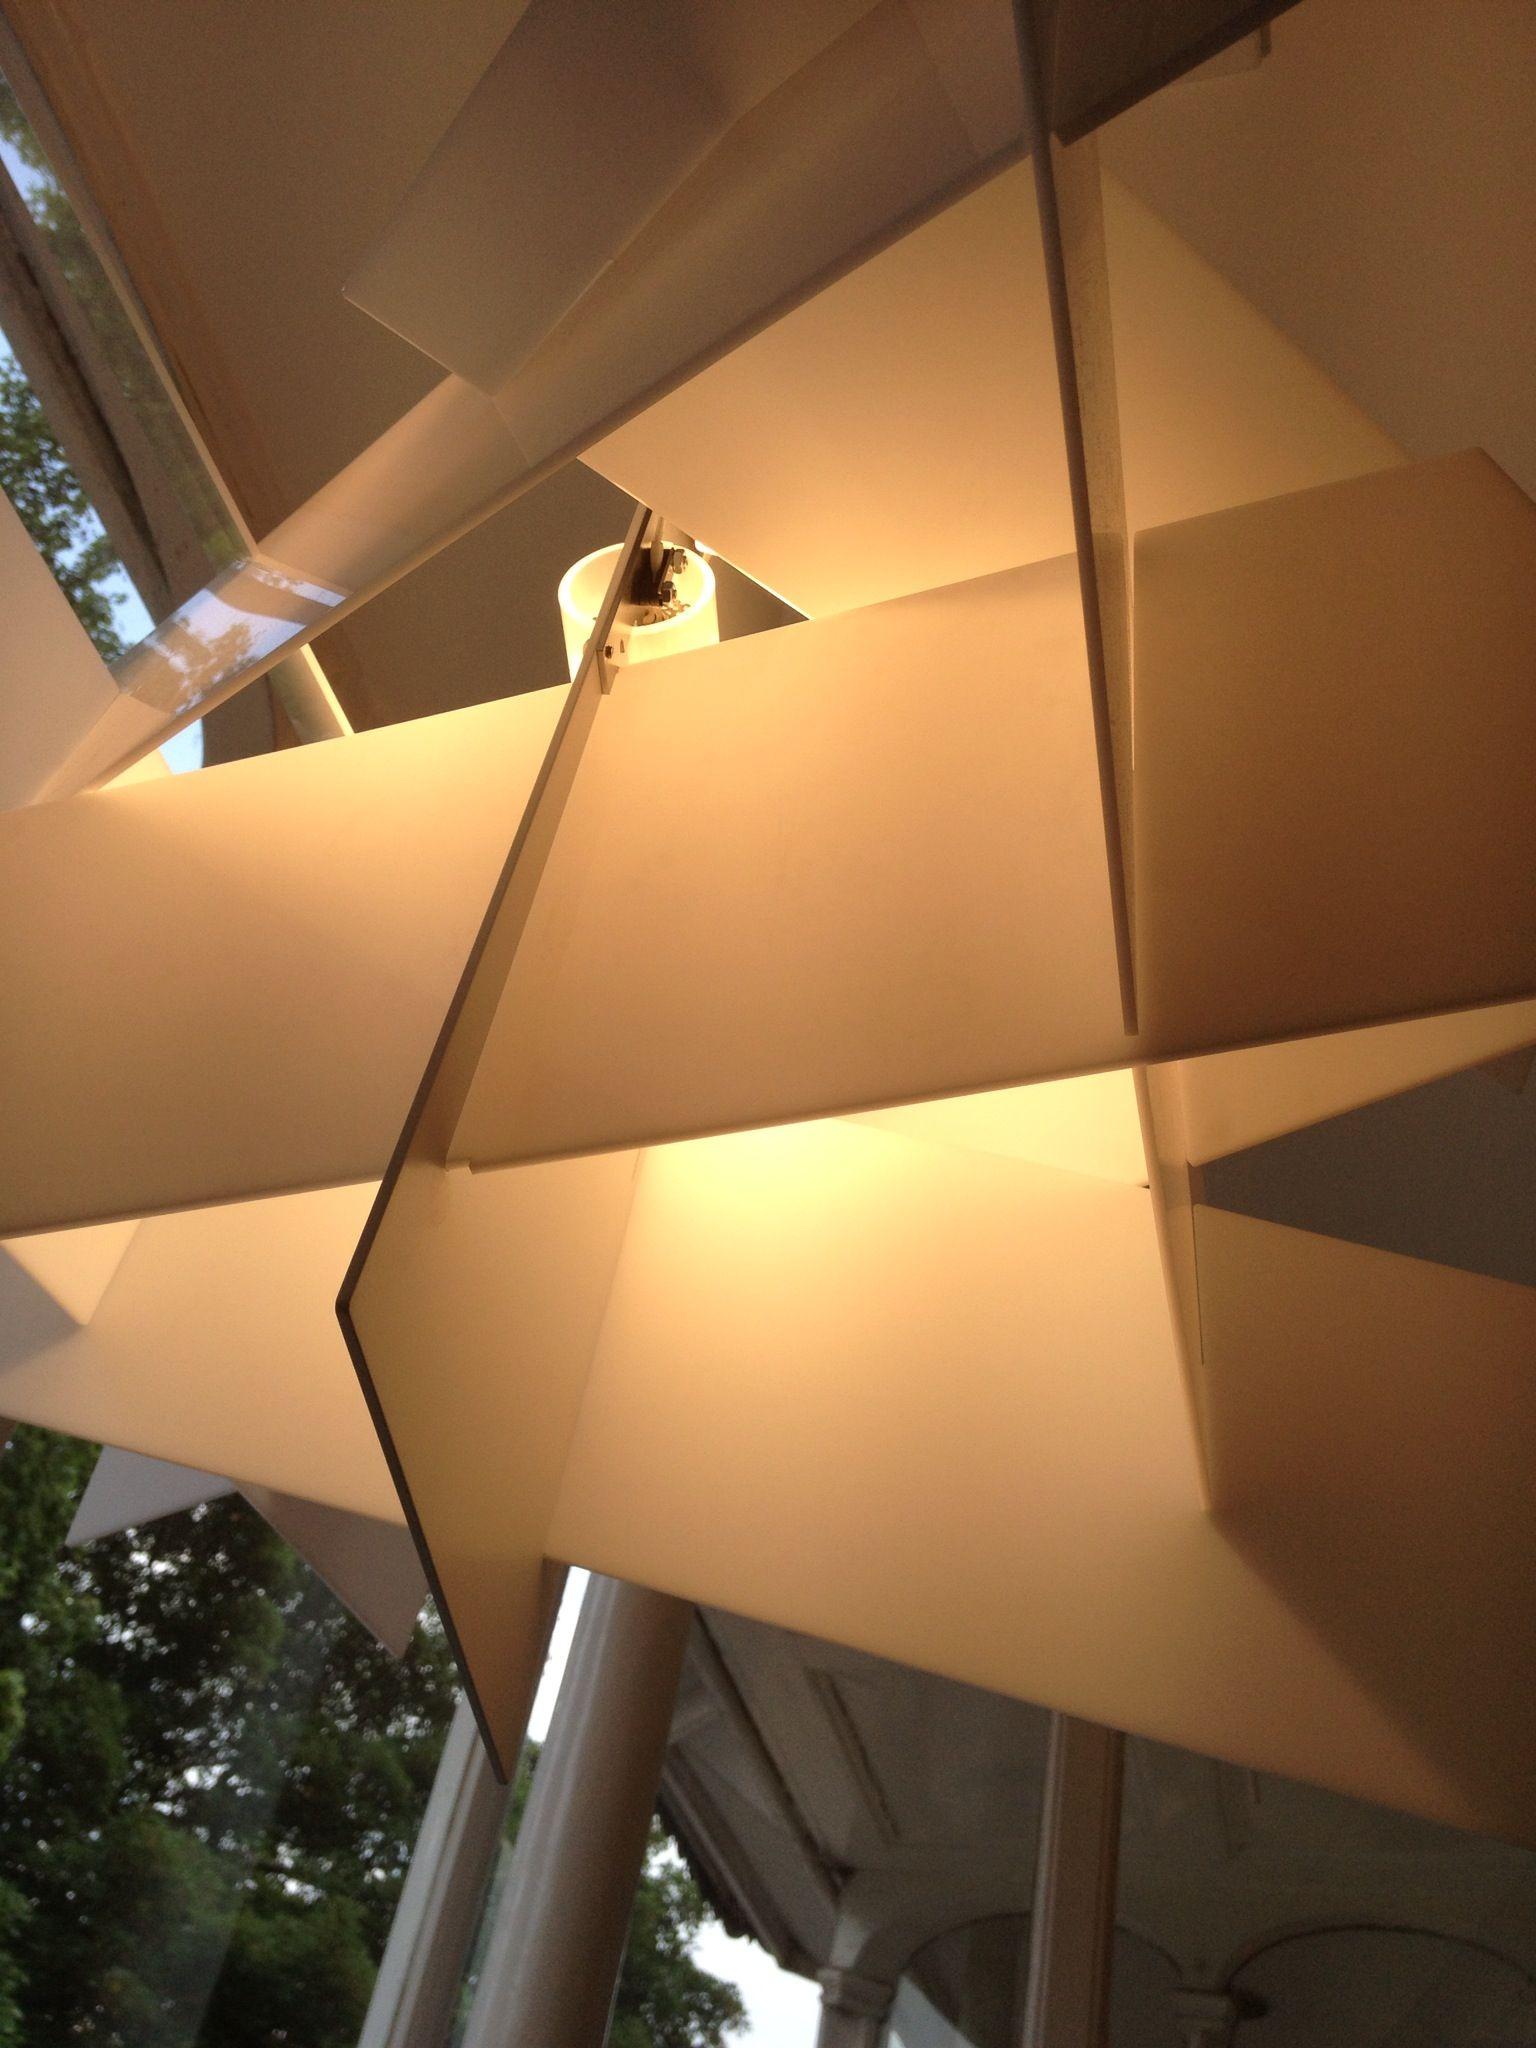 Pin de cimmermann interiors en foscarini lighting wall - Lamparas oliva ...